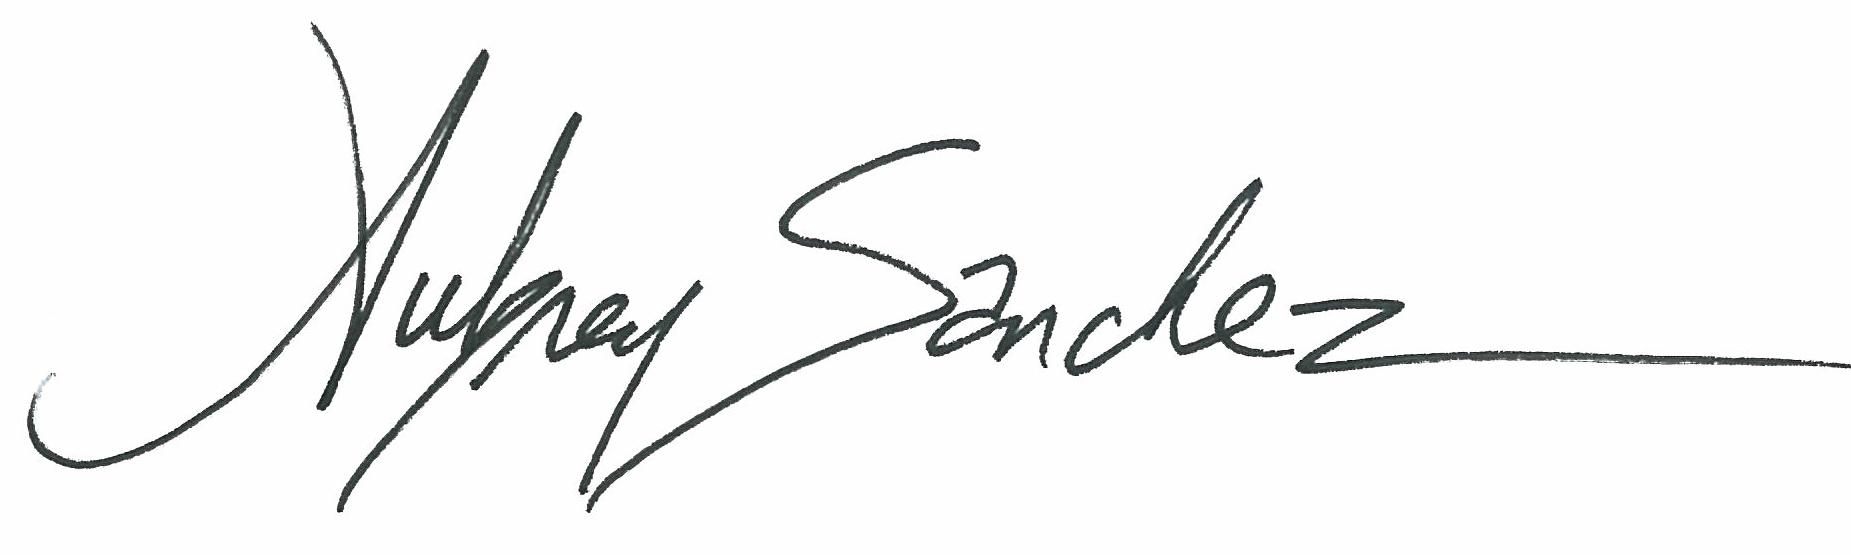 Aubrey Sanchez's Signature